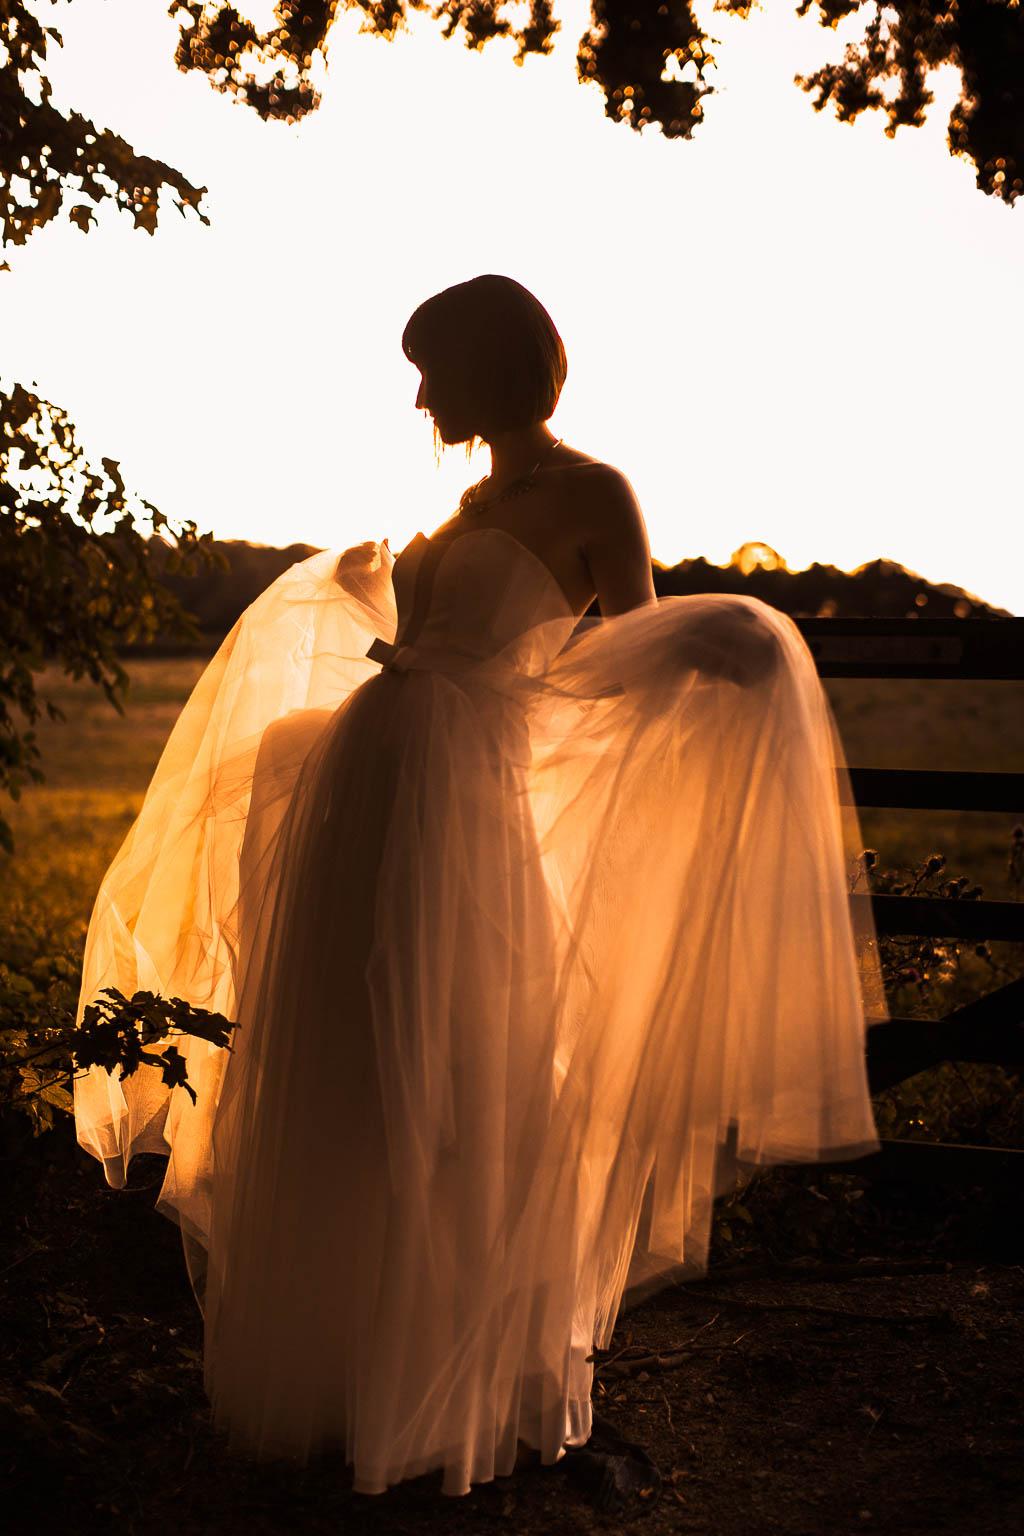 documentary-wedding-alternative-photographer-ireland-katie-farrell-cool-wedding-photographer-ireland-katie-farrell-photography-341